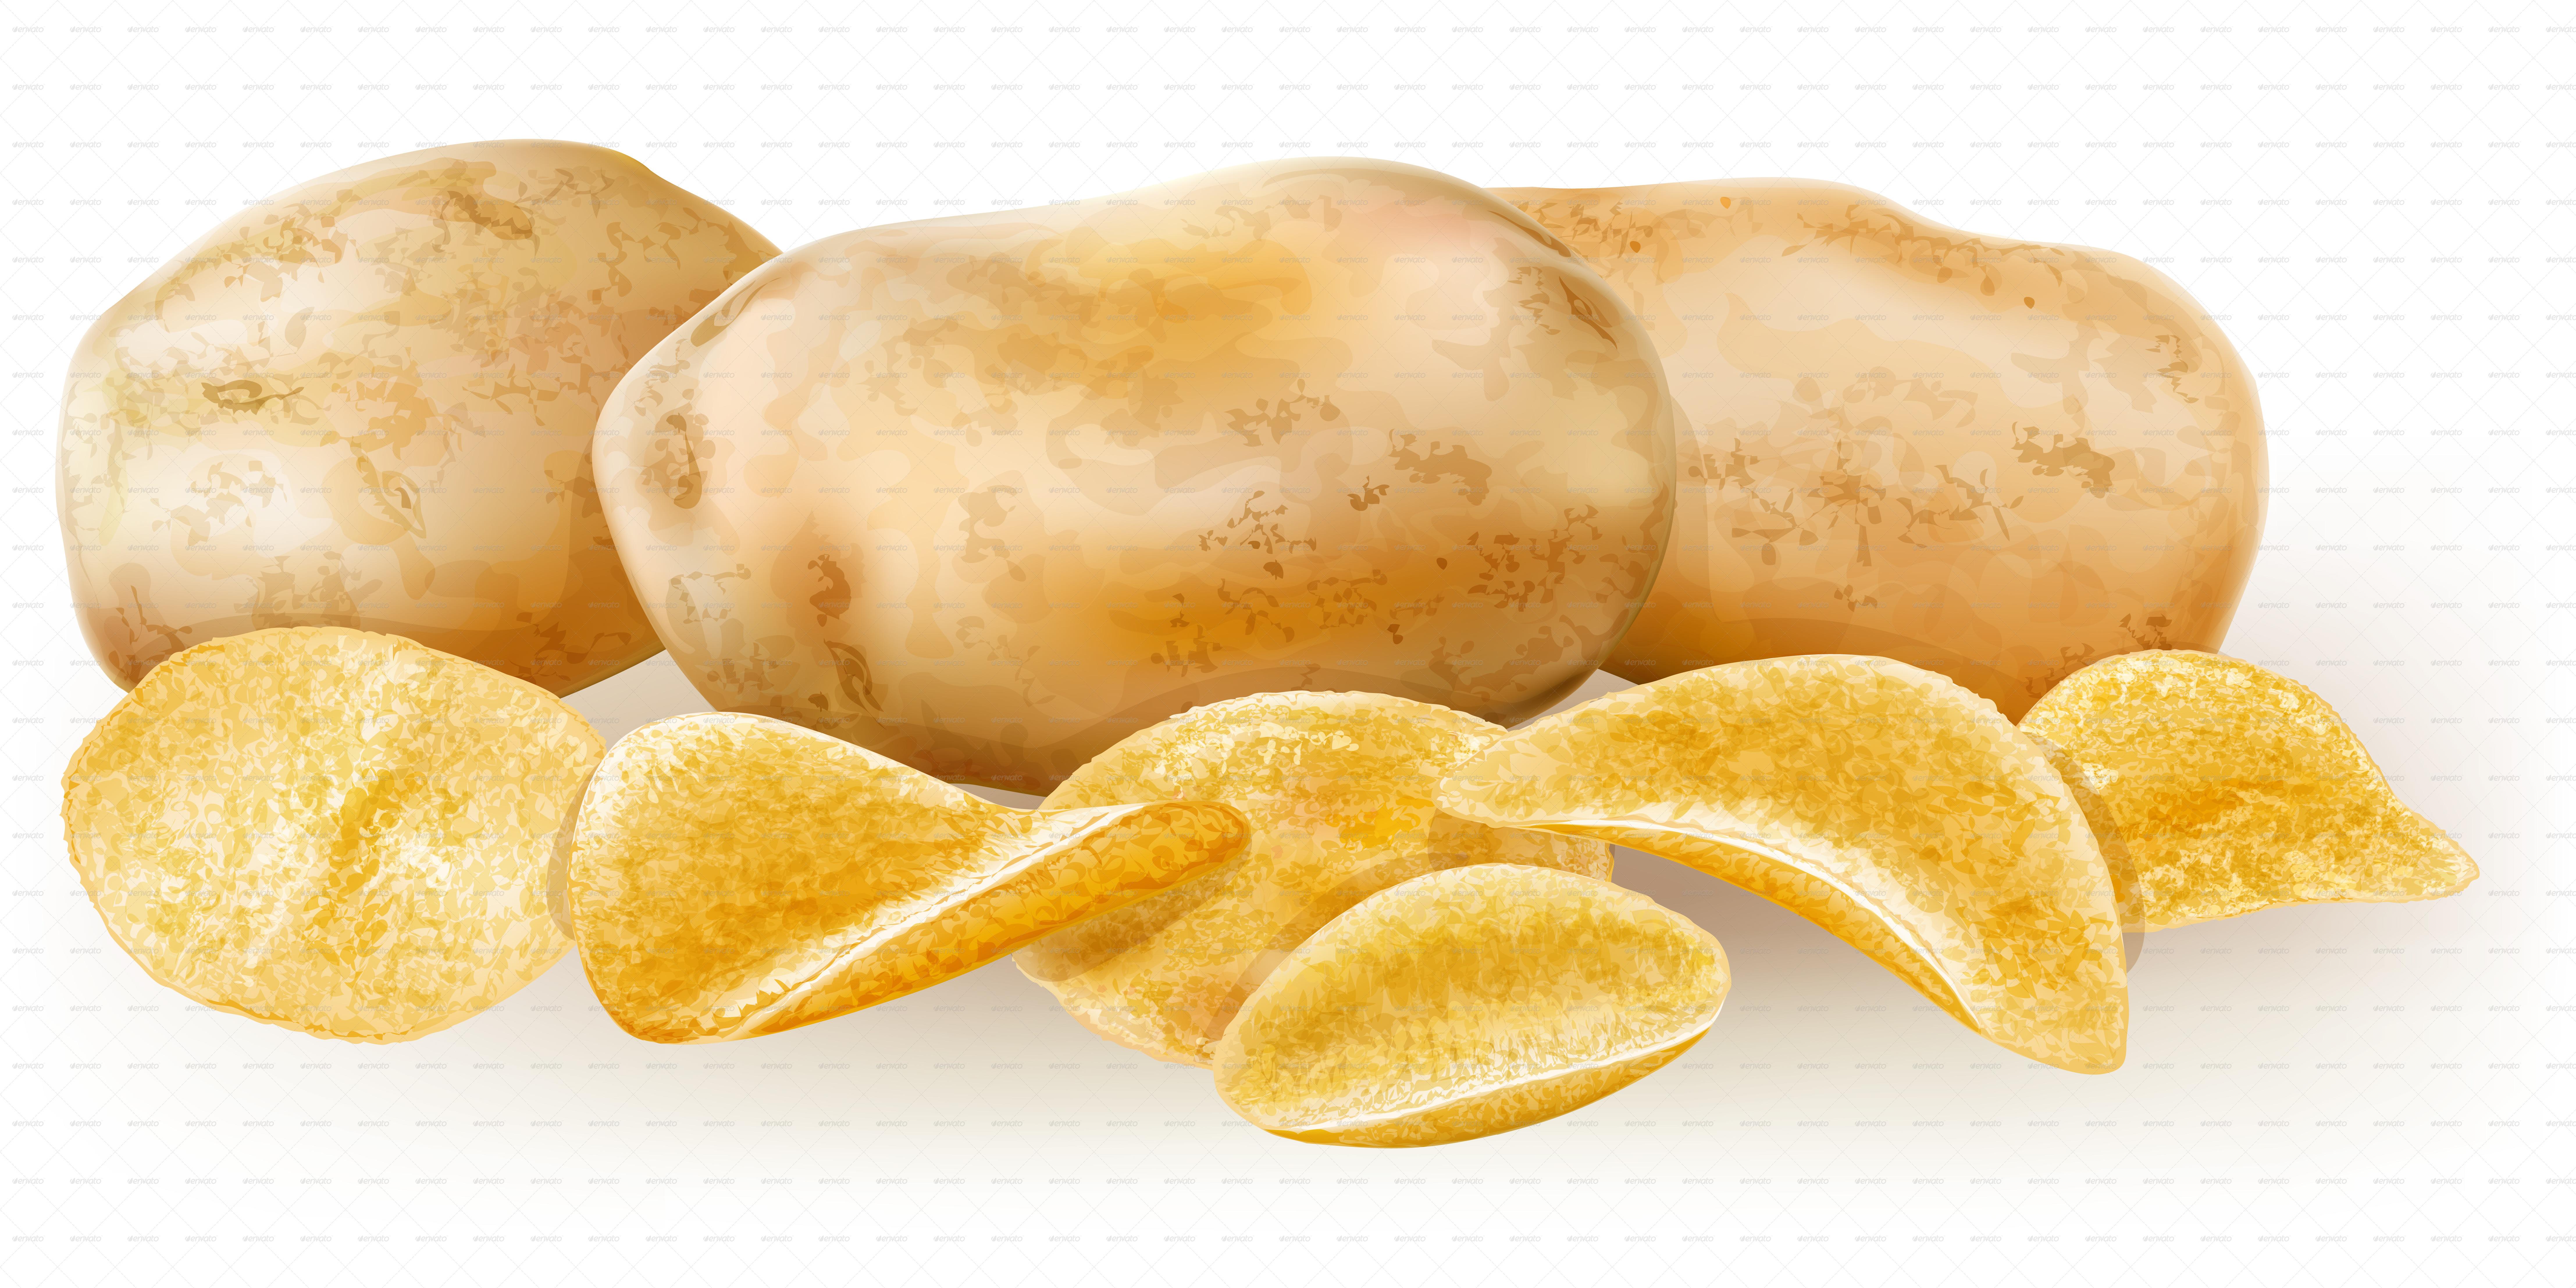 Potato Chips Images Potatos And Potato Chips